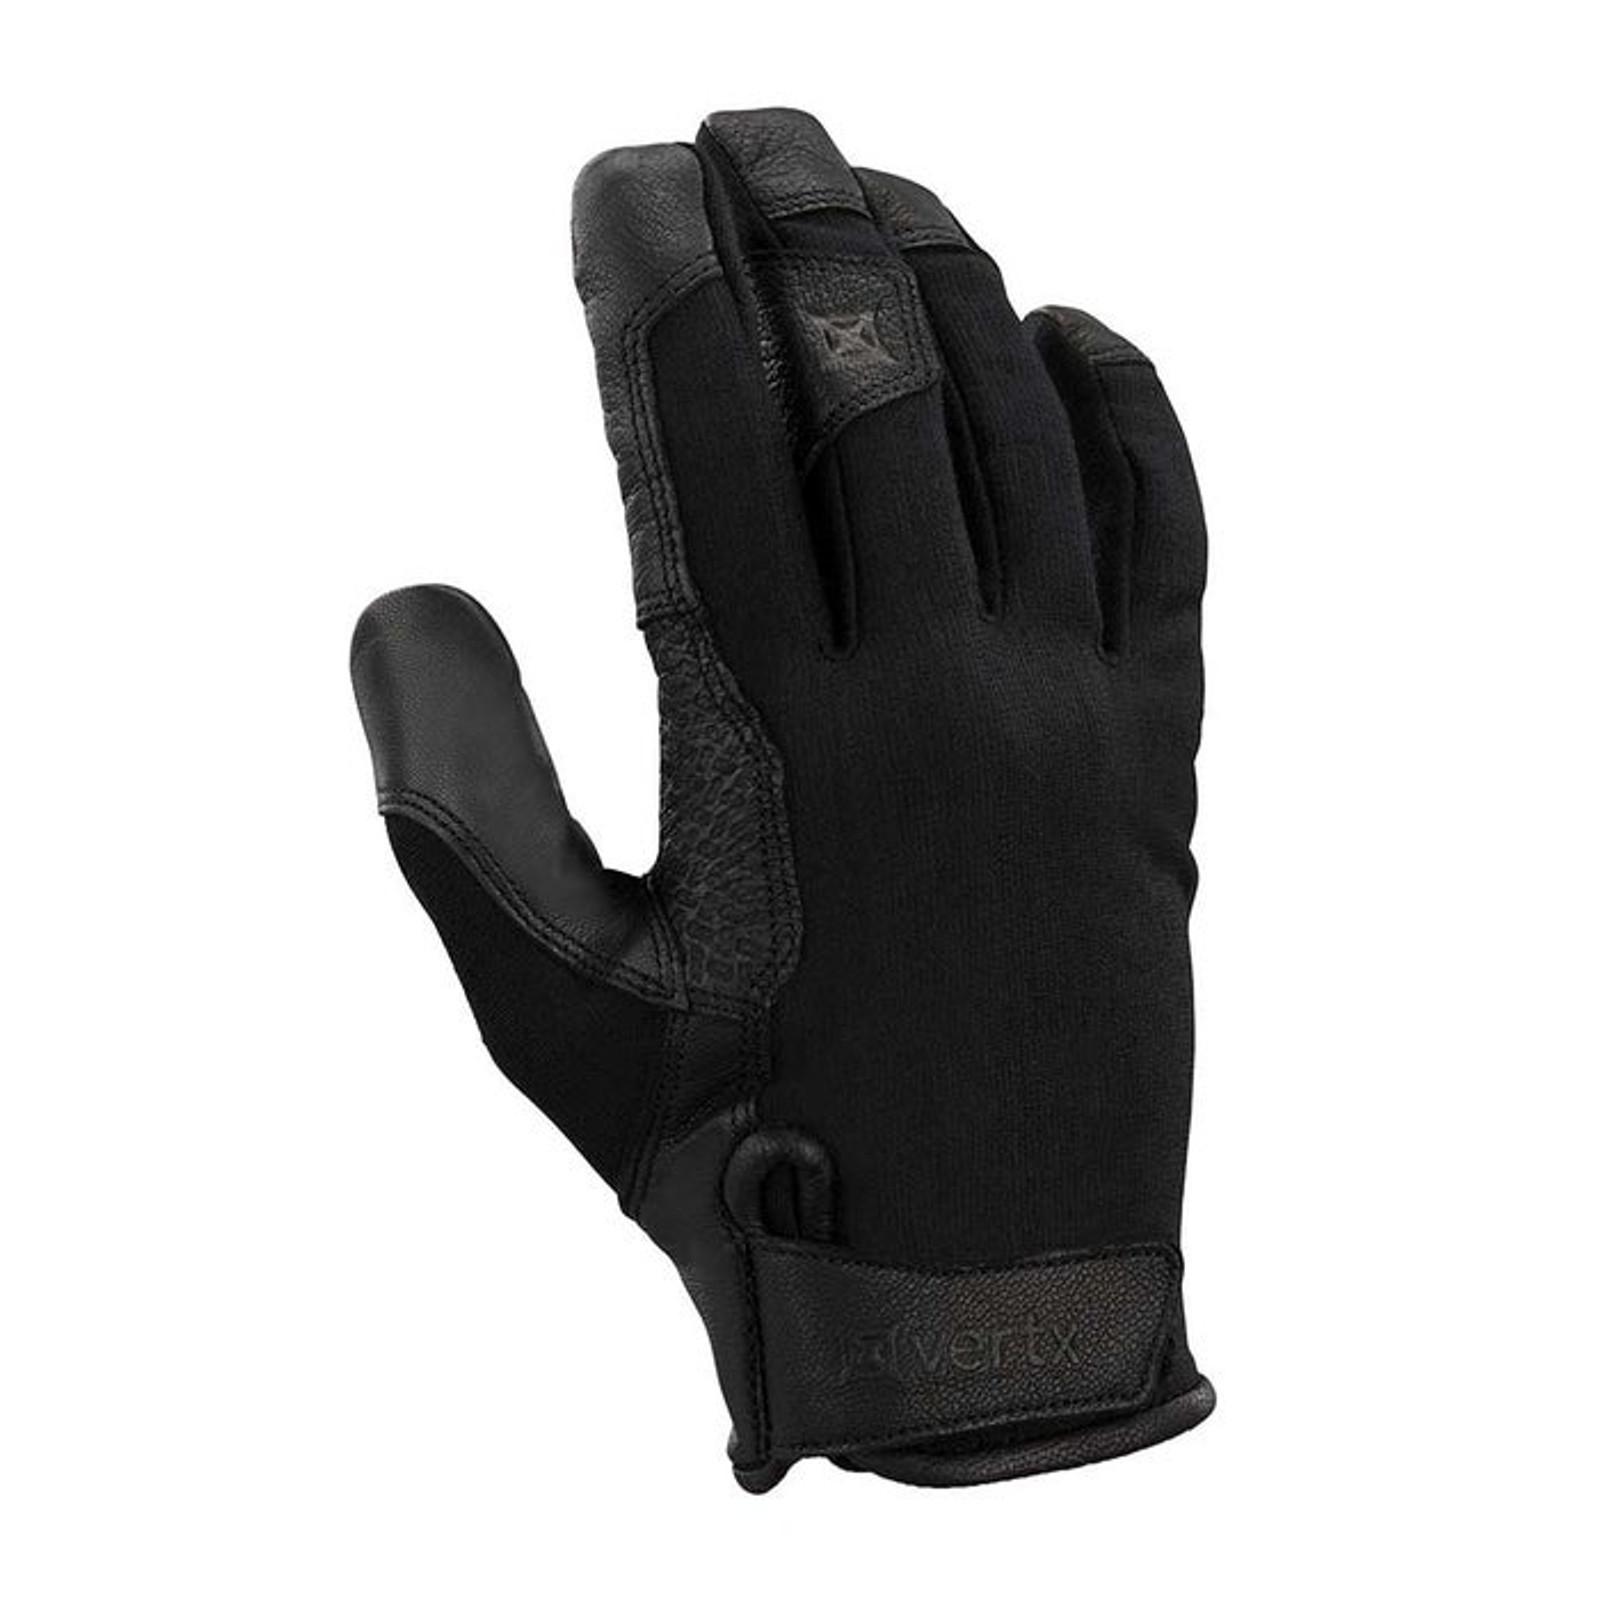 Course of Fire Gloves - Vertx